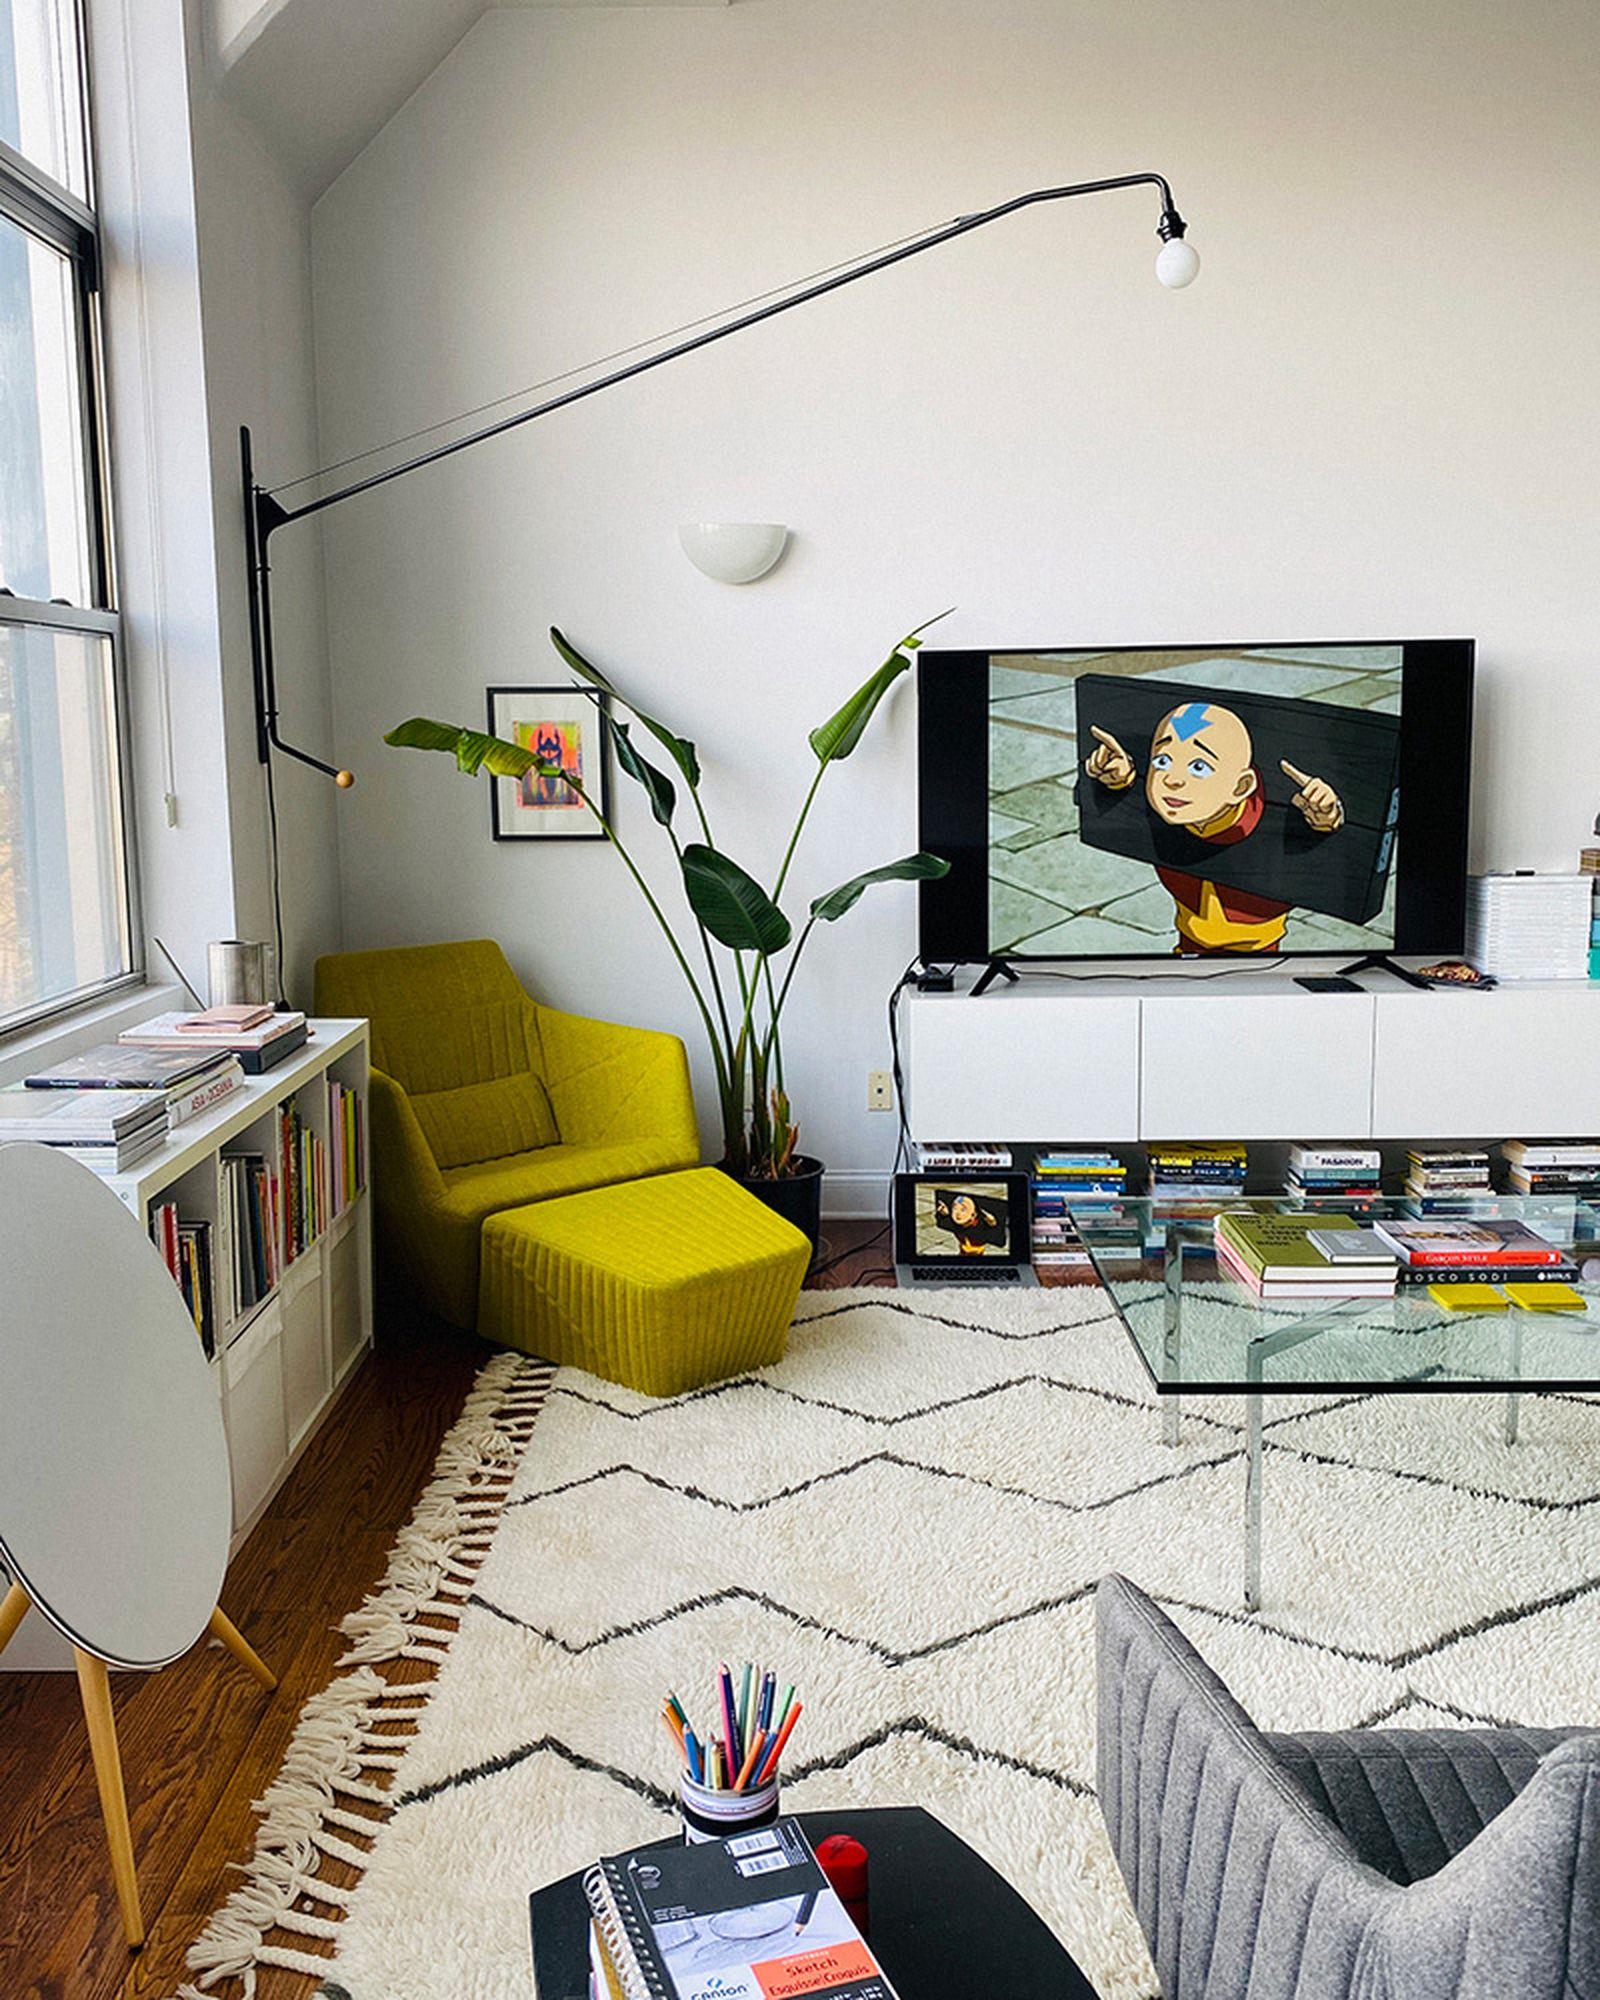 wfh-office-tour-look-inside-home-offices-tyler-joe-03